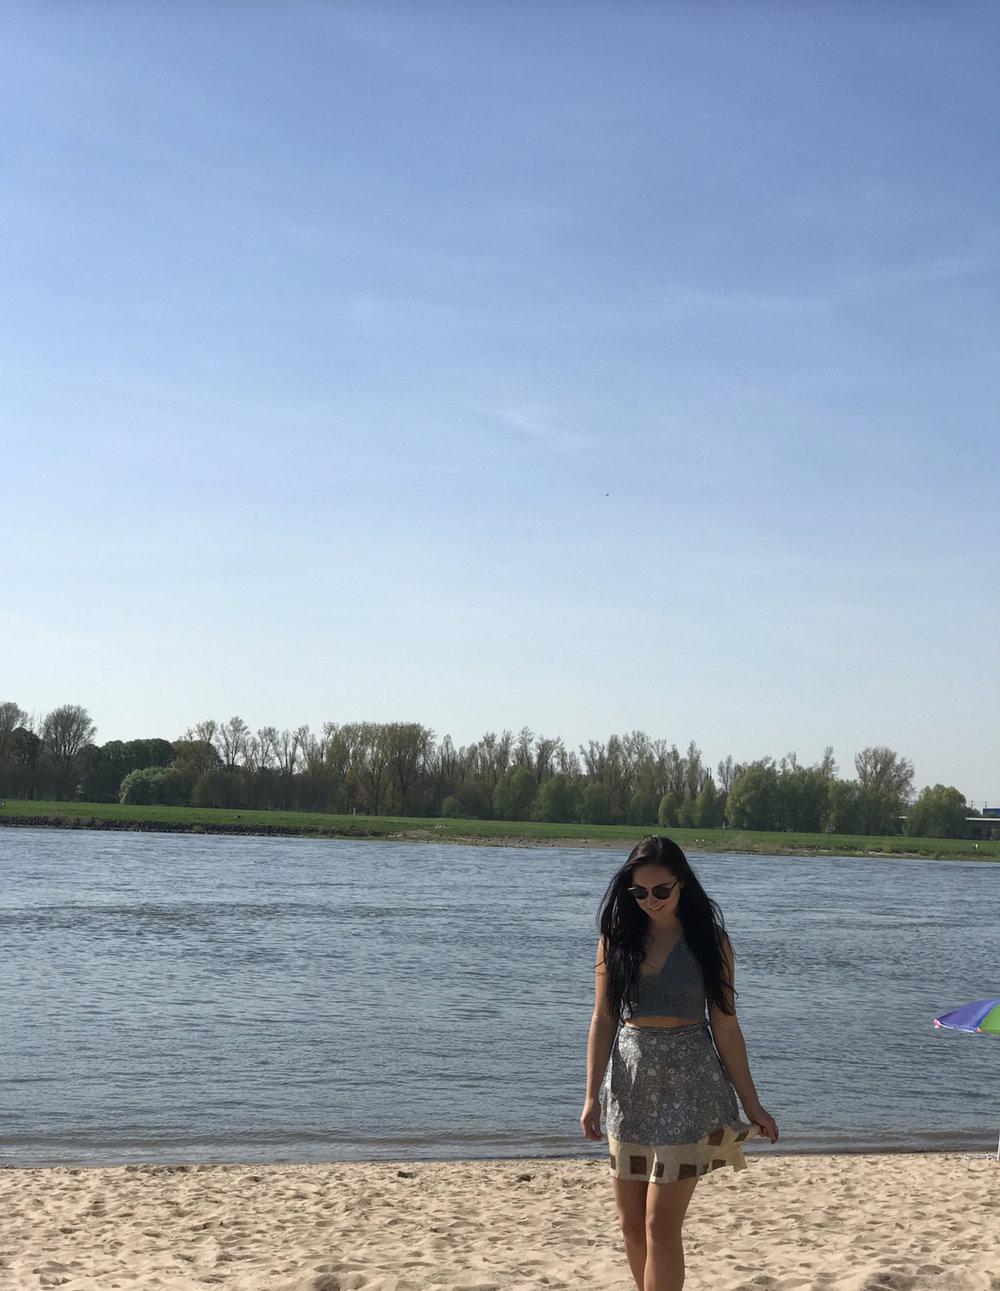 A river bank (almost beach) in Düsseldorf.